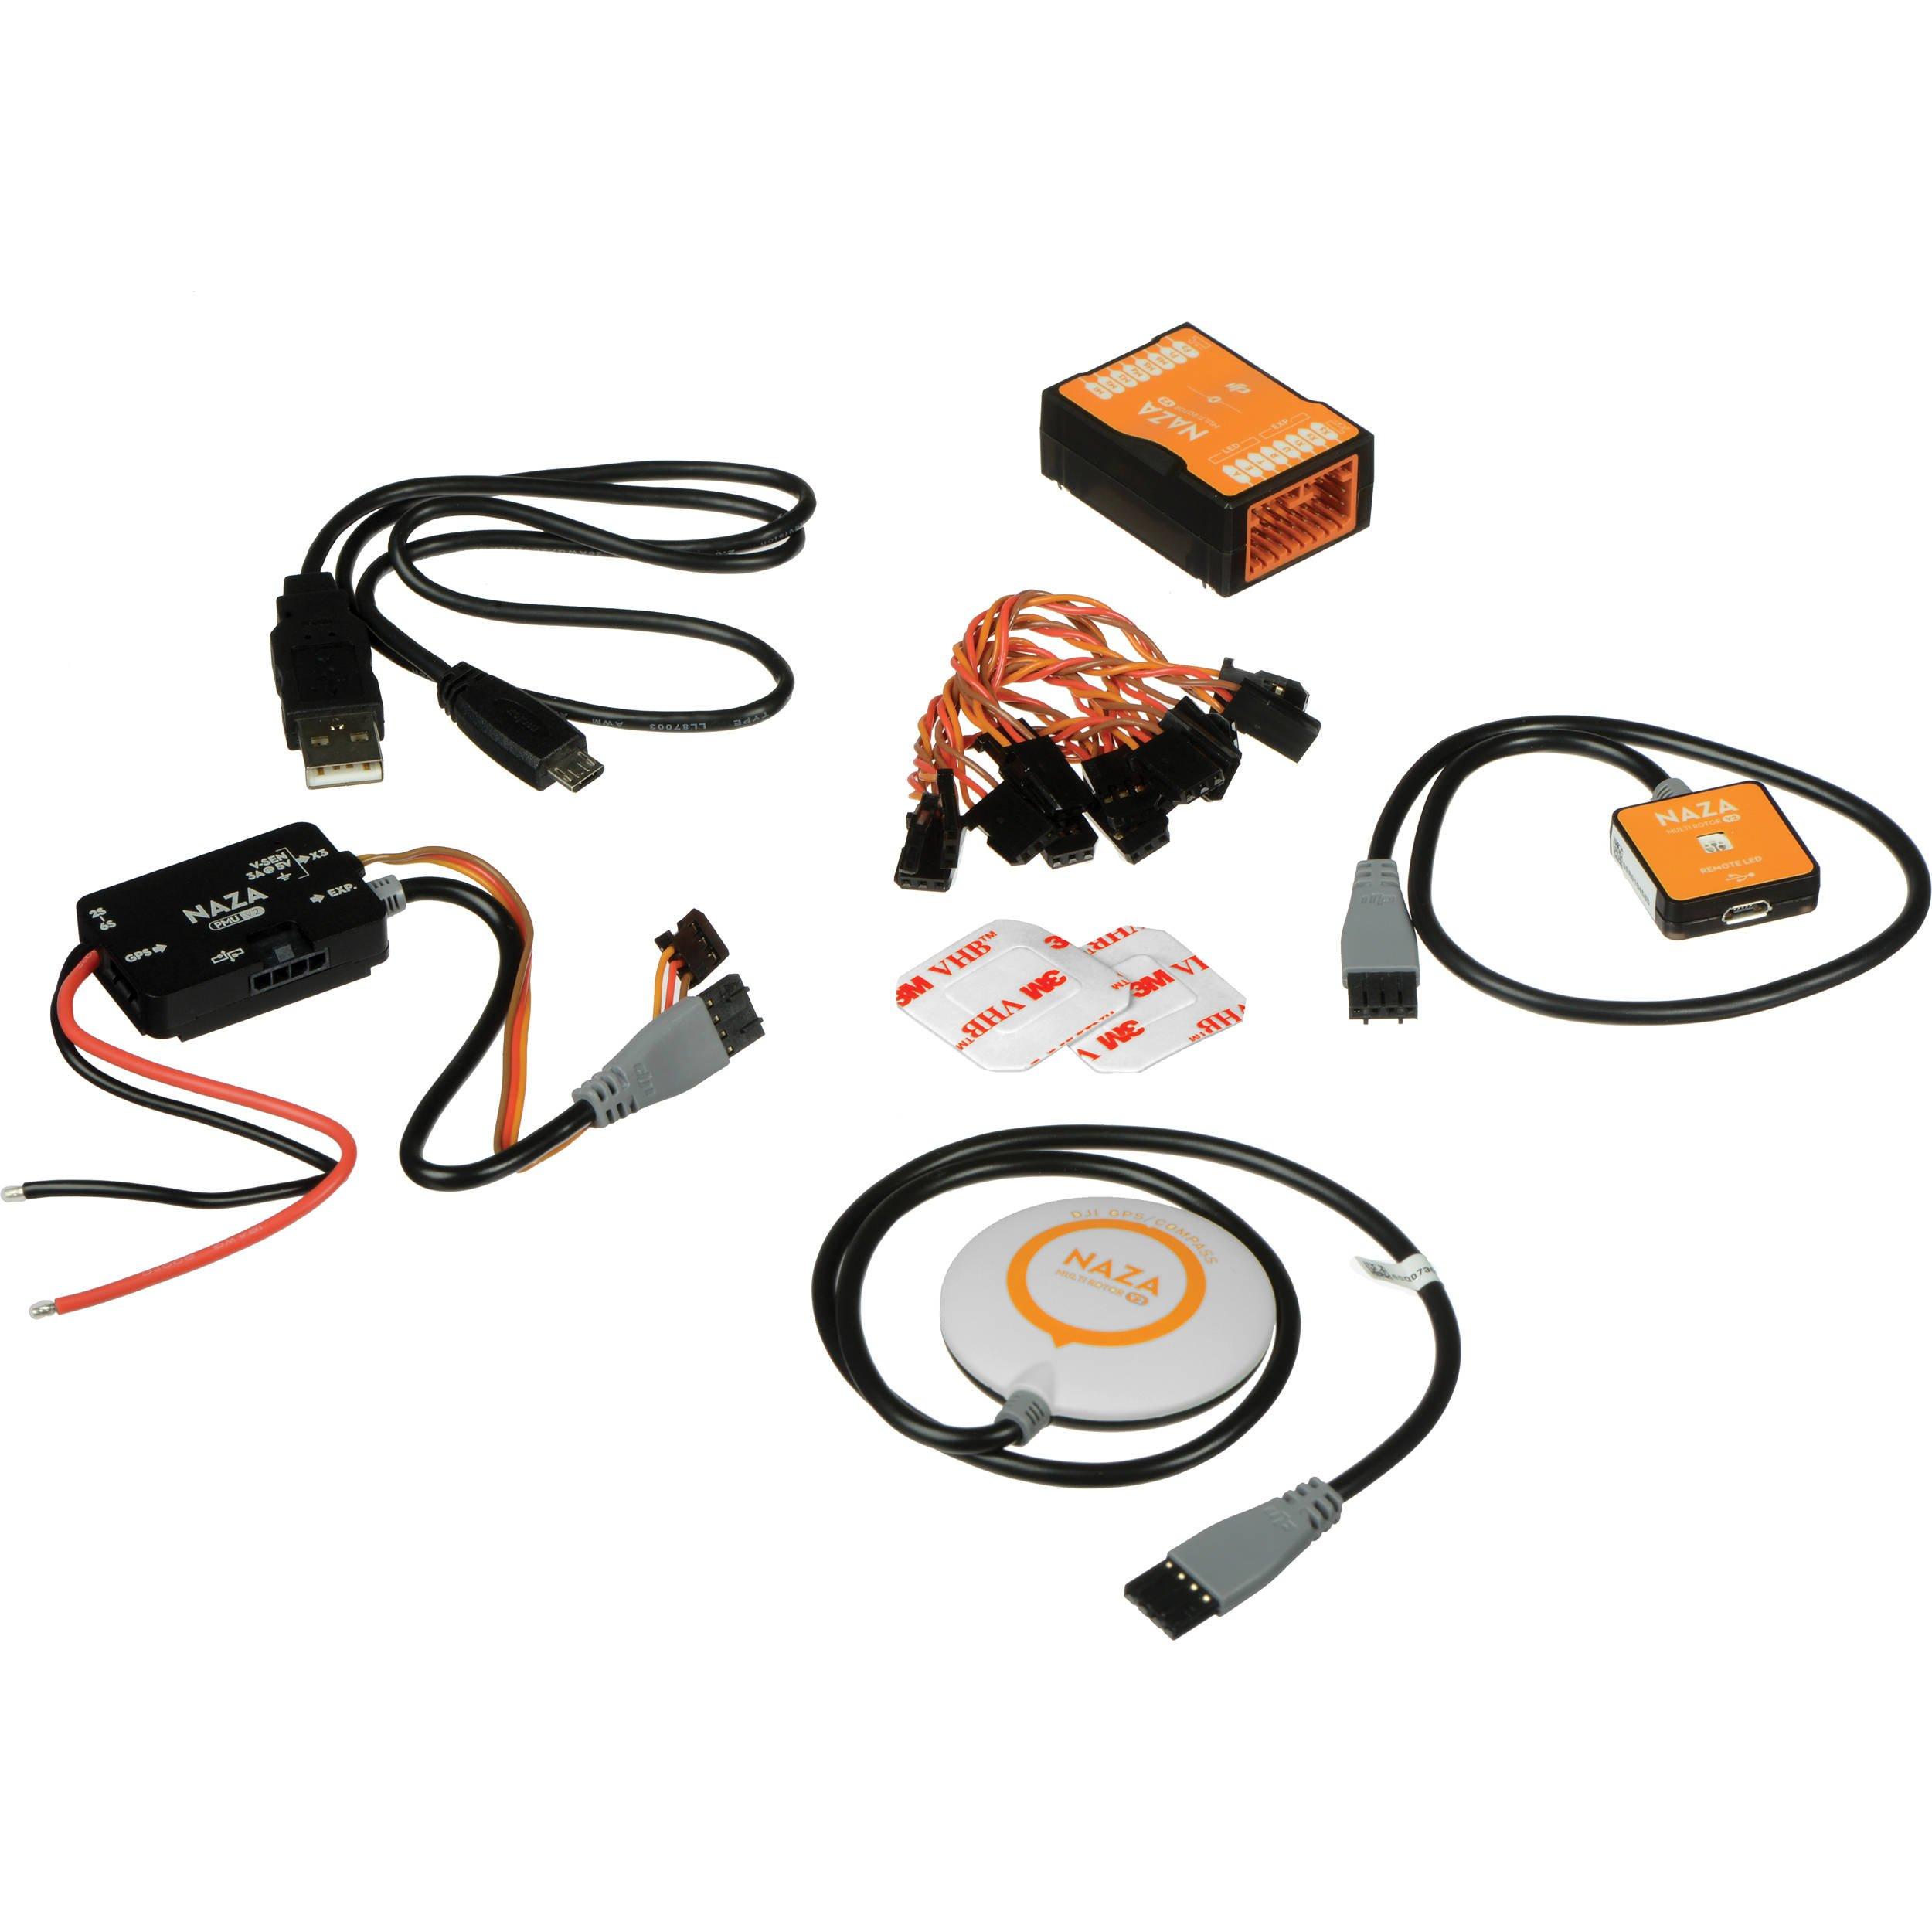 DJI NAZA-M V2 Multirotor Autopilot Controller set With GPS